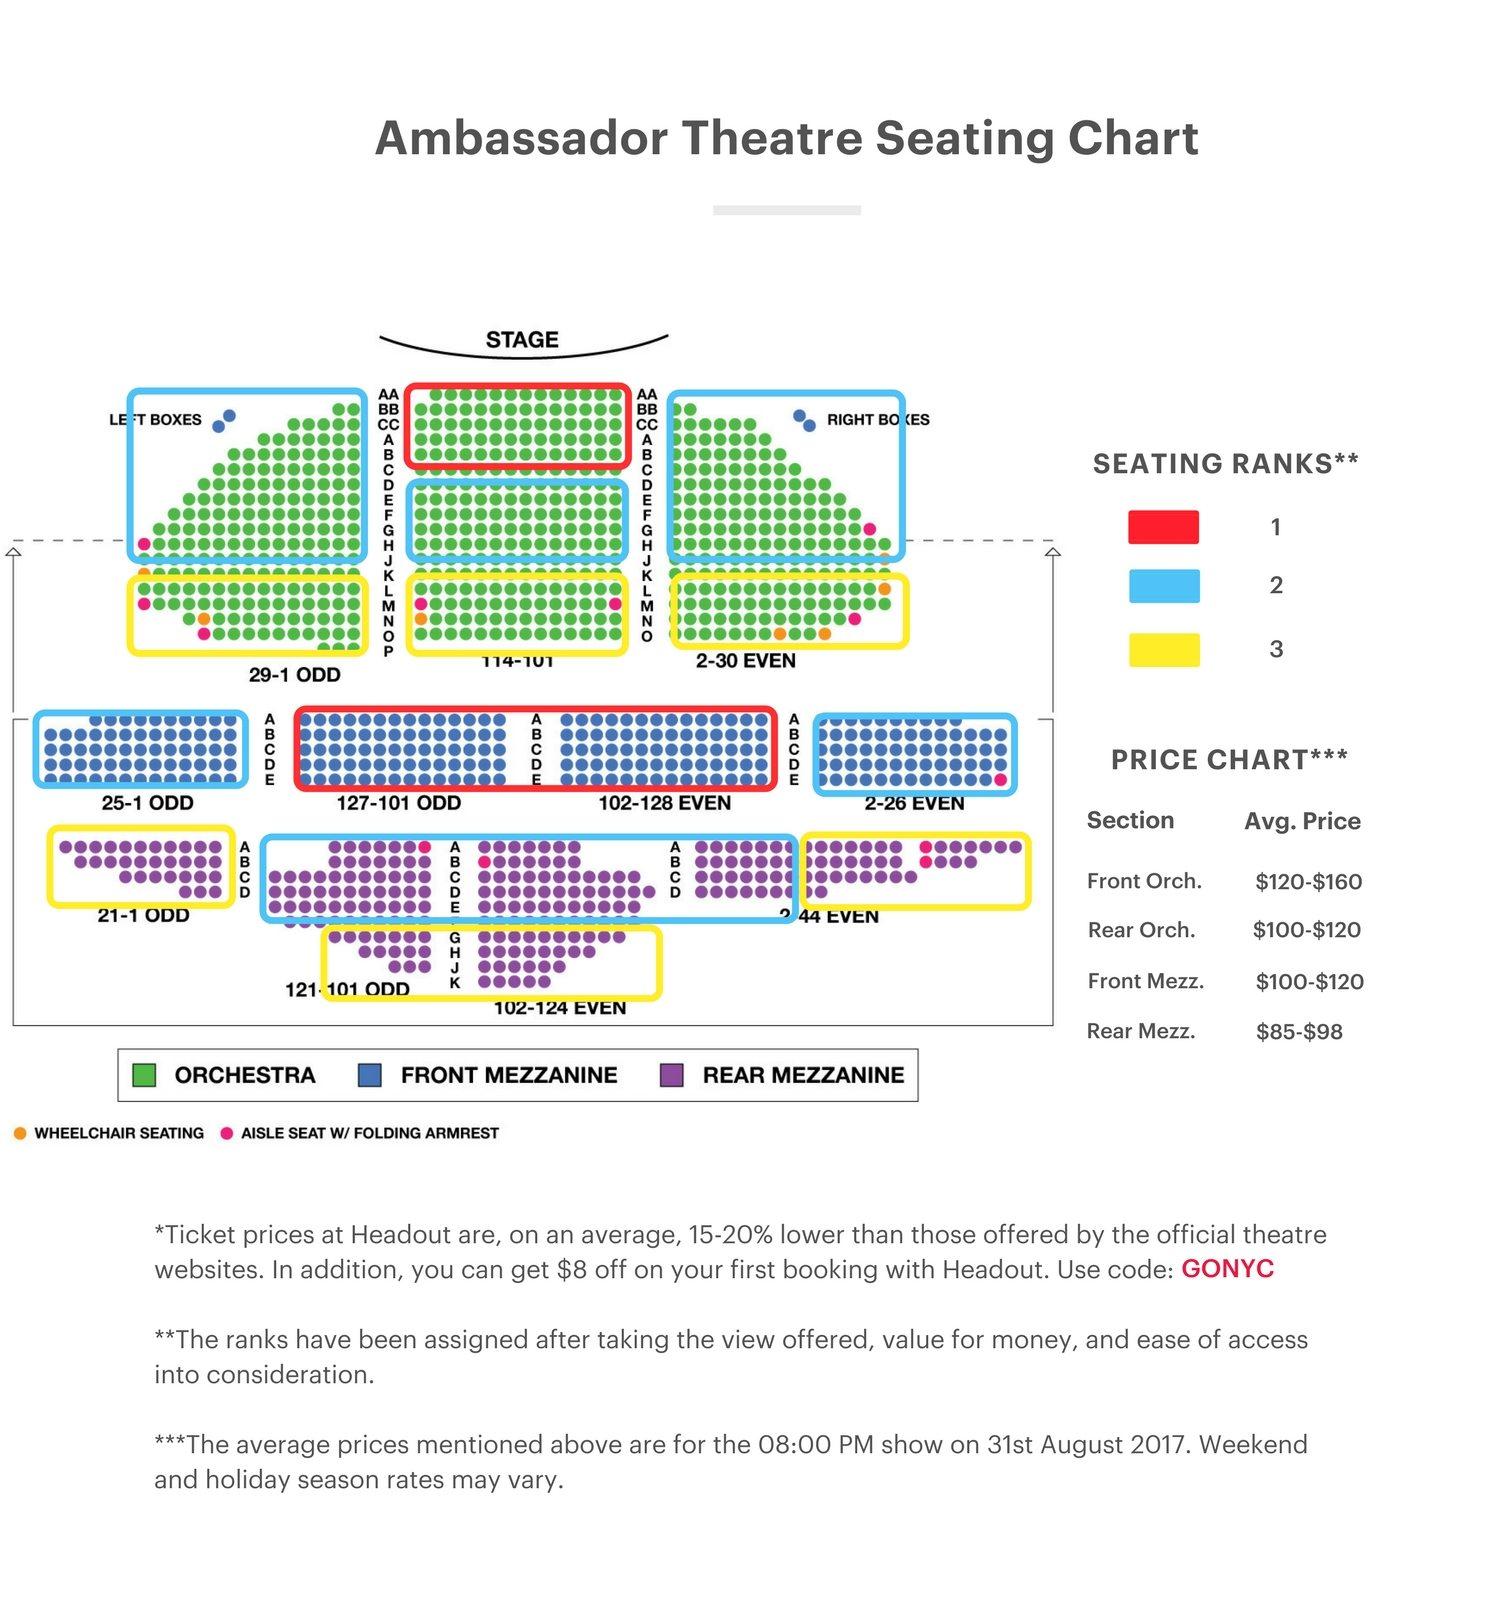 Ambador Theatre Seating Chart